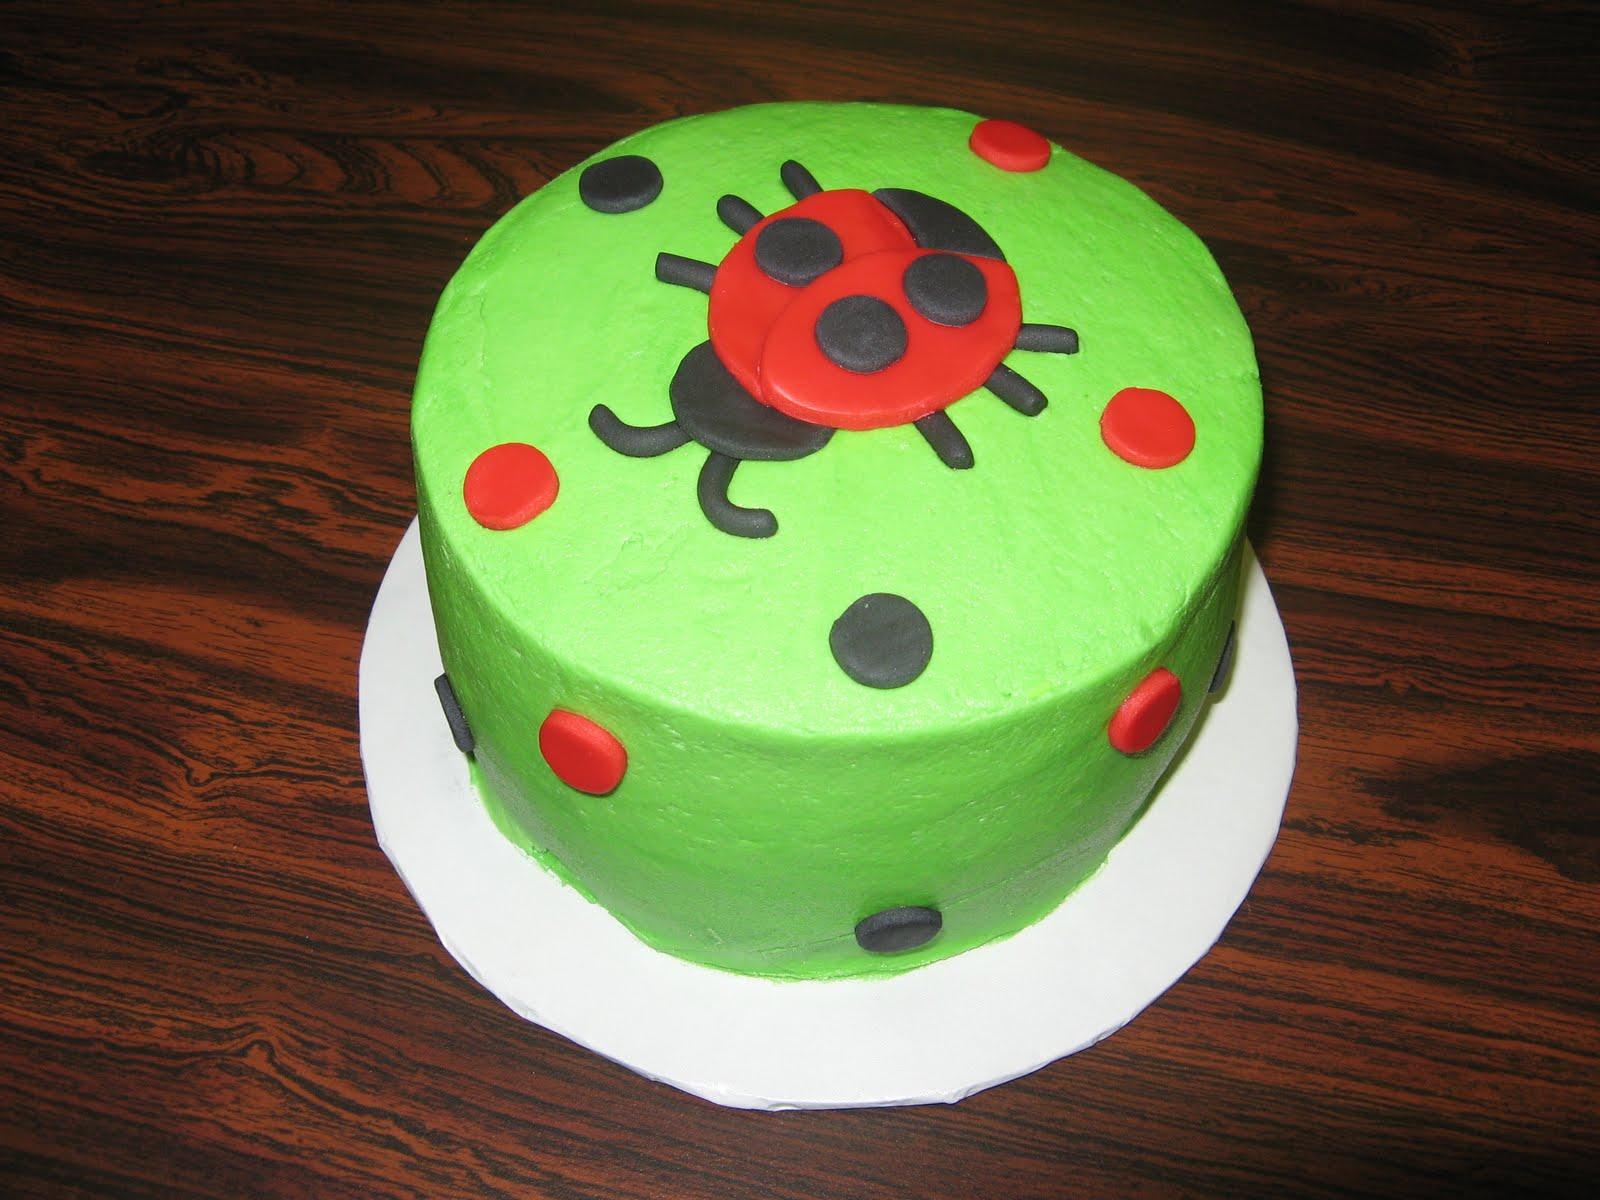 Fondant Decor On Buttercream Cake : Tasty Creations: Happy Birthday Everyone!